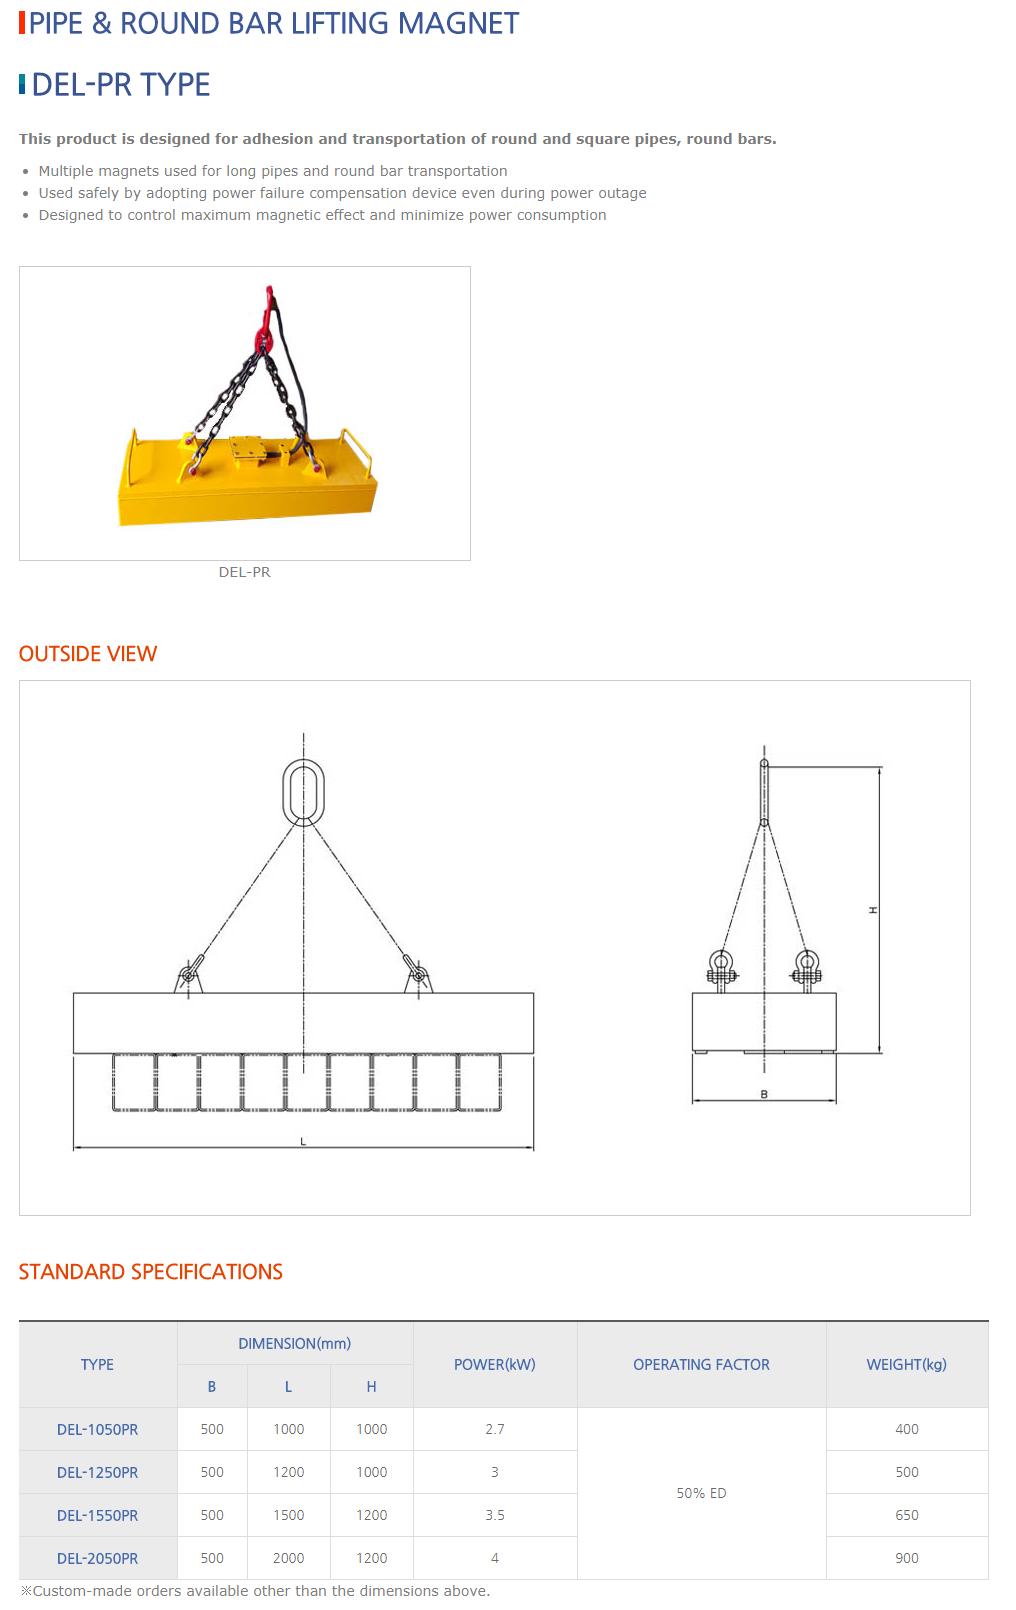 DAESUNG MARGNET Pipe & Round Bar Lifting Magnet DEL-PR Type